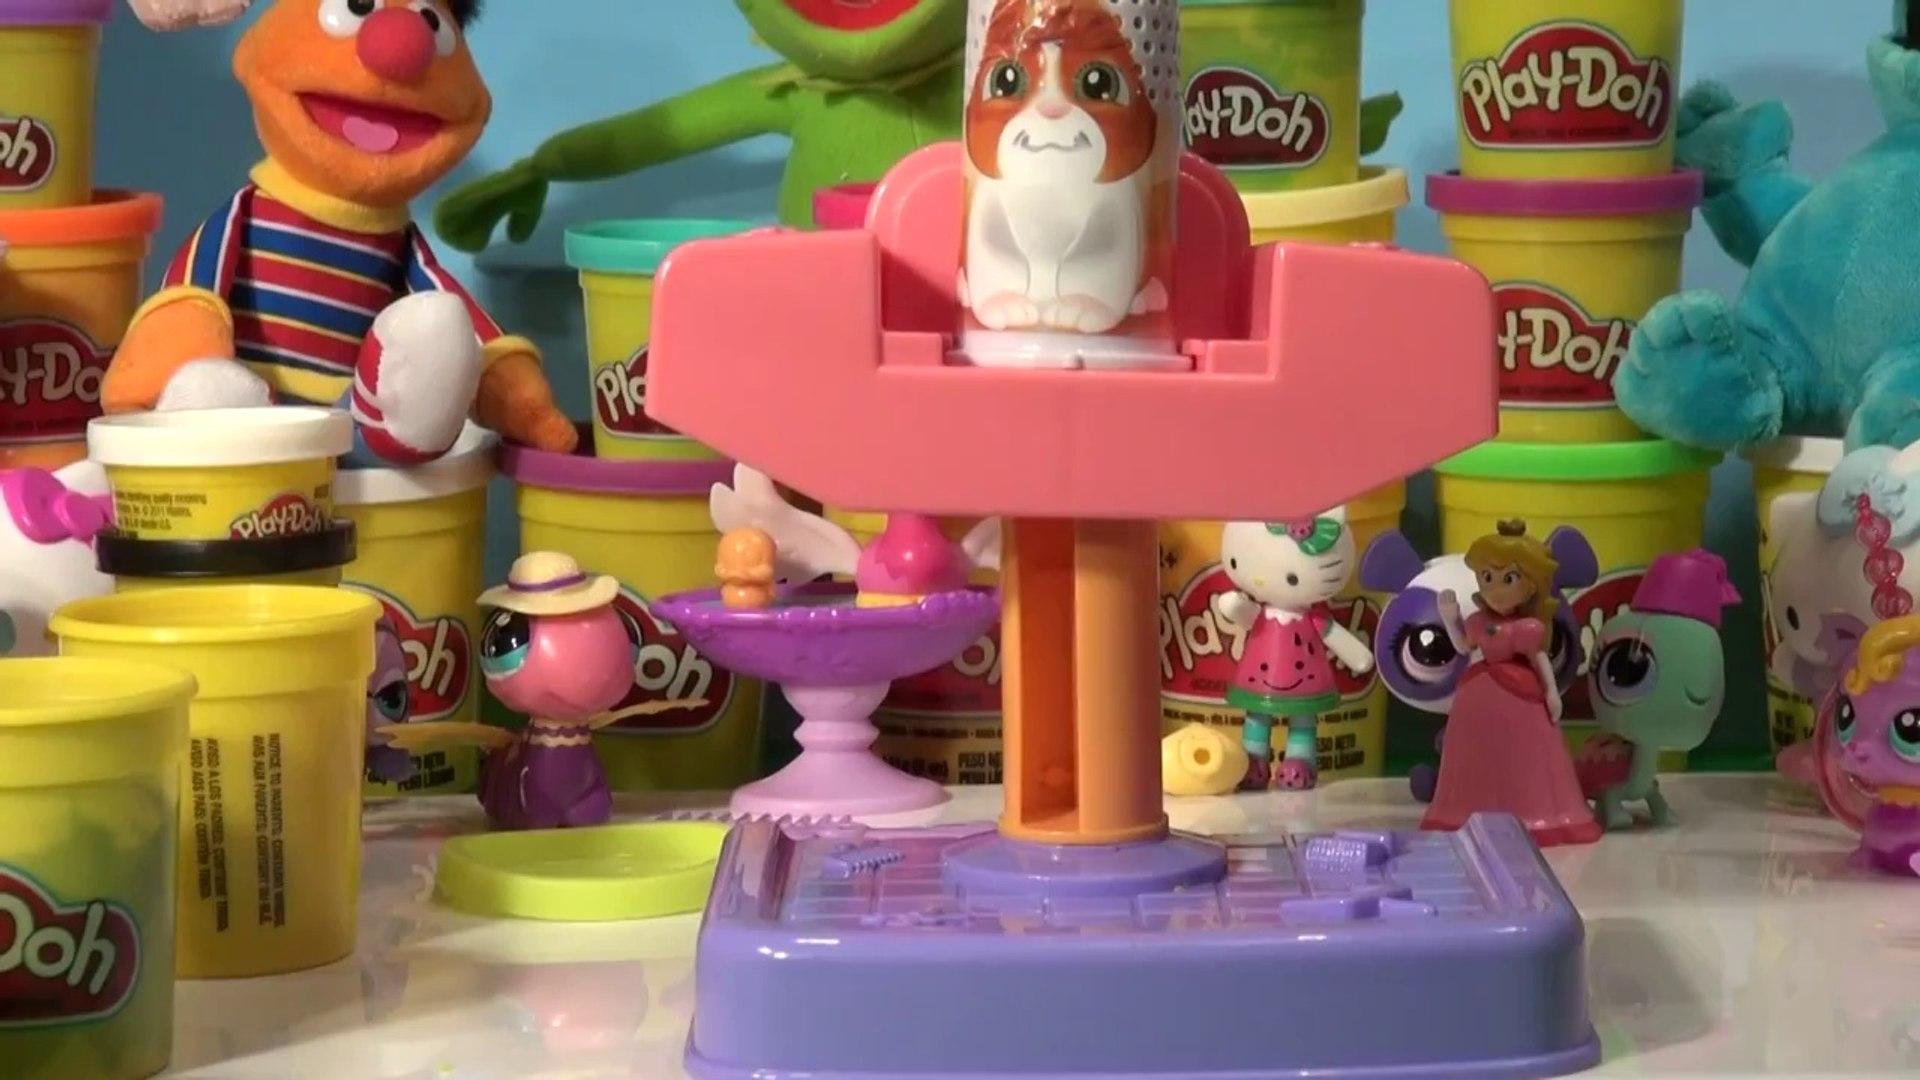 Littlest Pet Shop Play Doh Fuzzy Pumper Pet Parlor with lots of Play Doh colors  crazy stuff